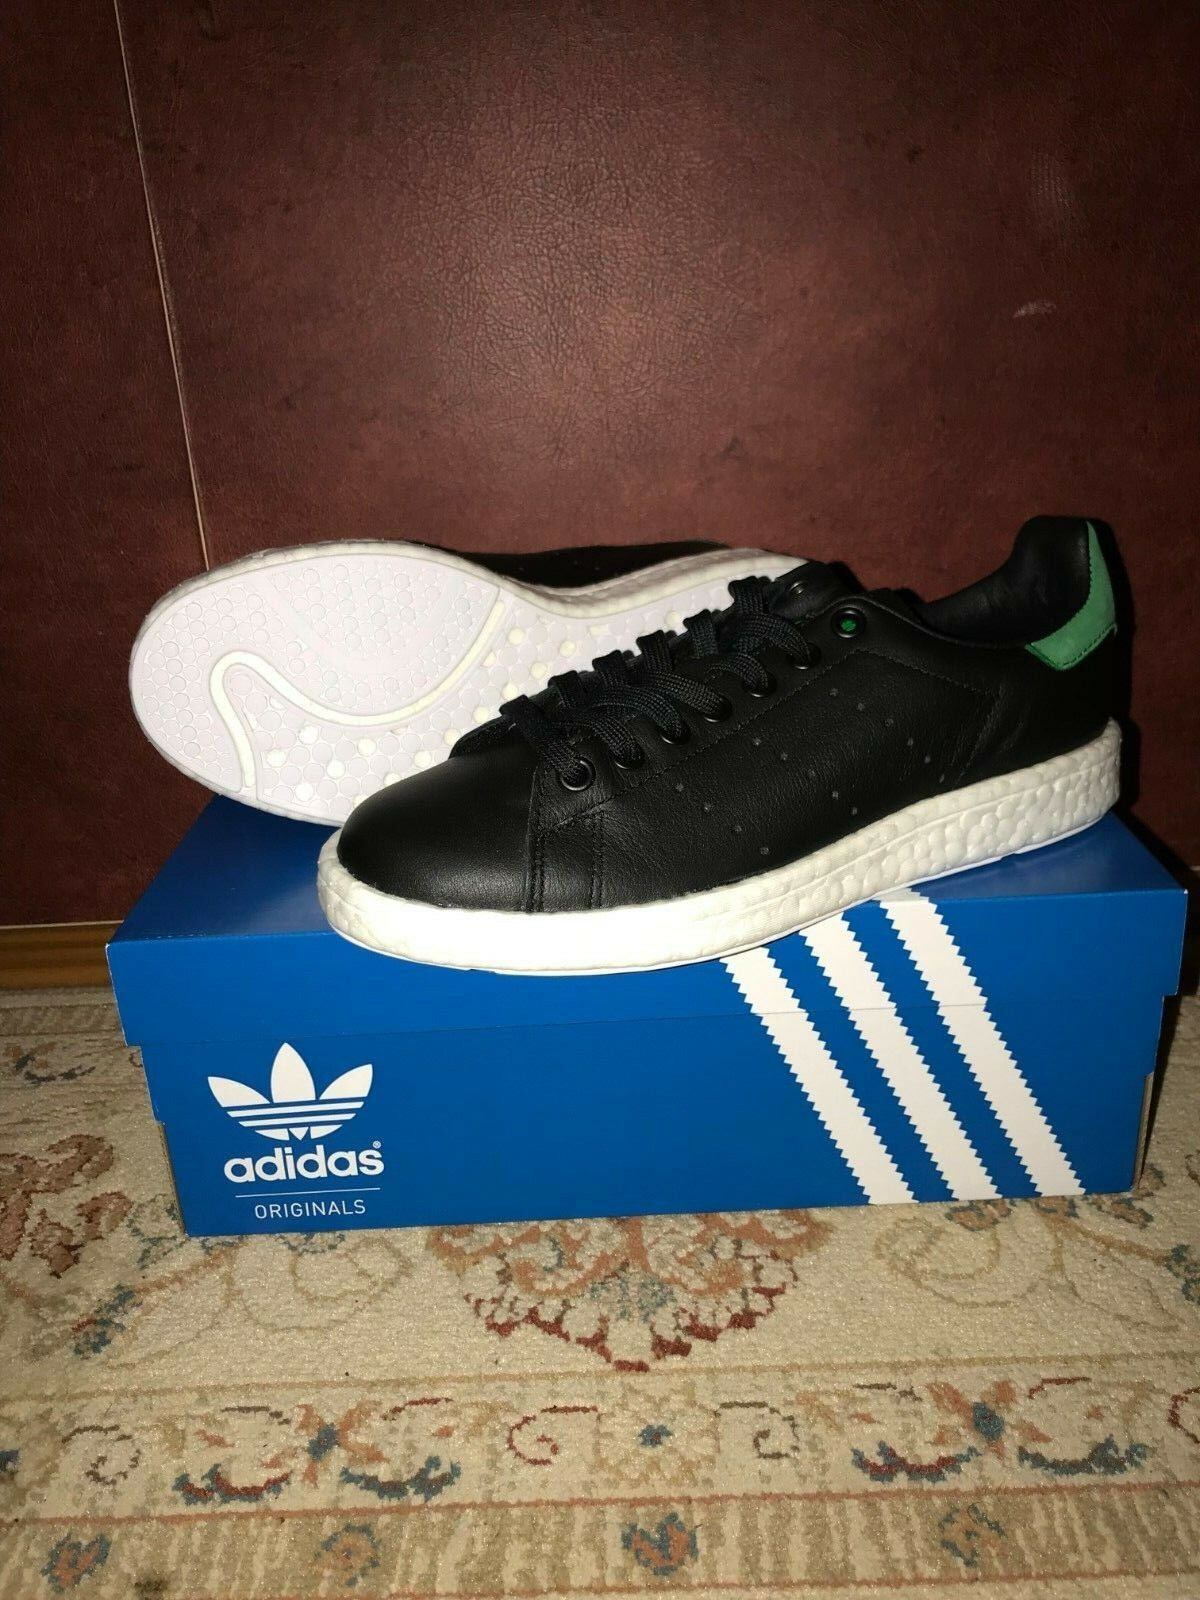 Adidas Originals Stan Smith Boost Core Black Green BB0009 SZ US 6.5-7